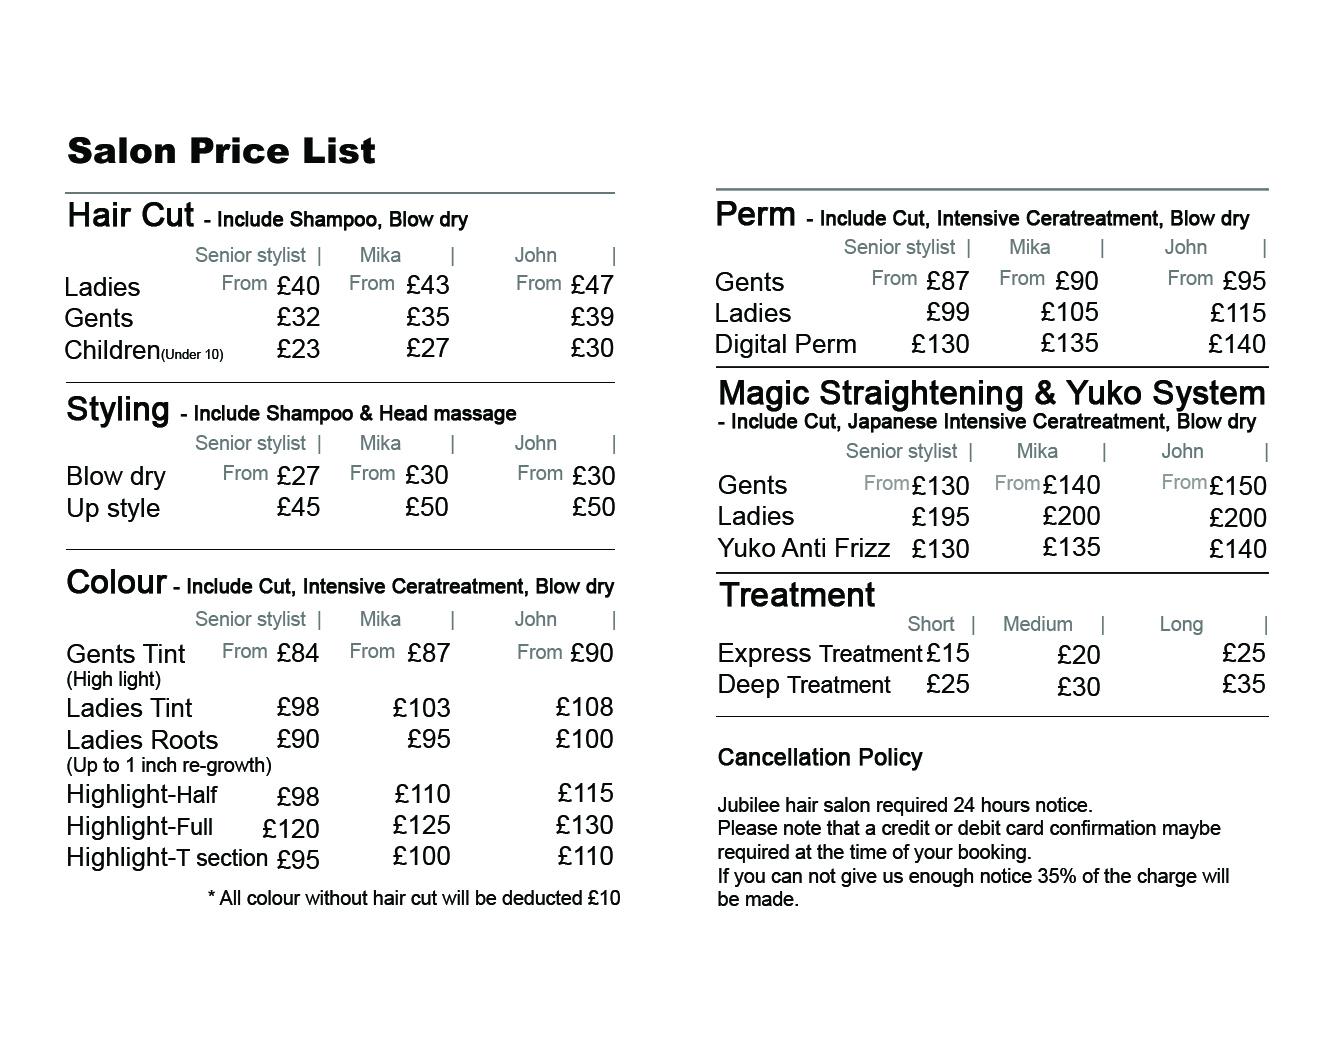 Jubilee Hair Salon Price List